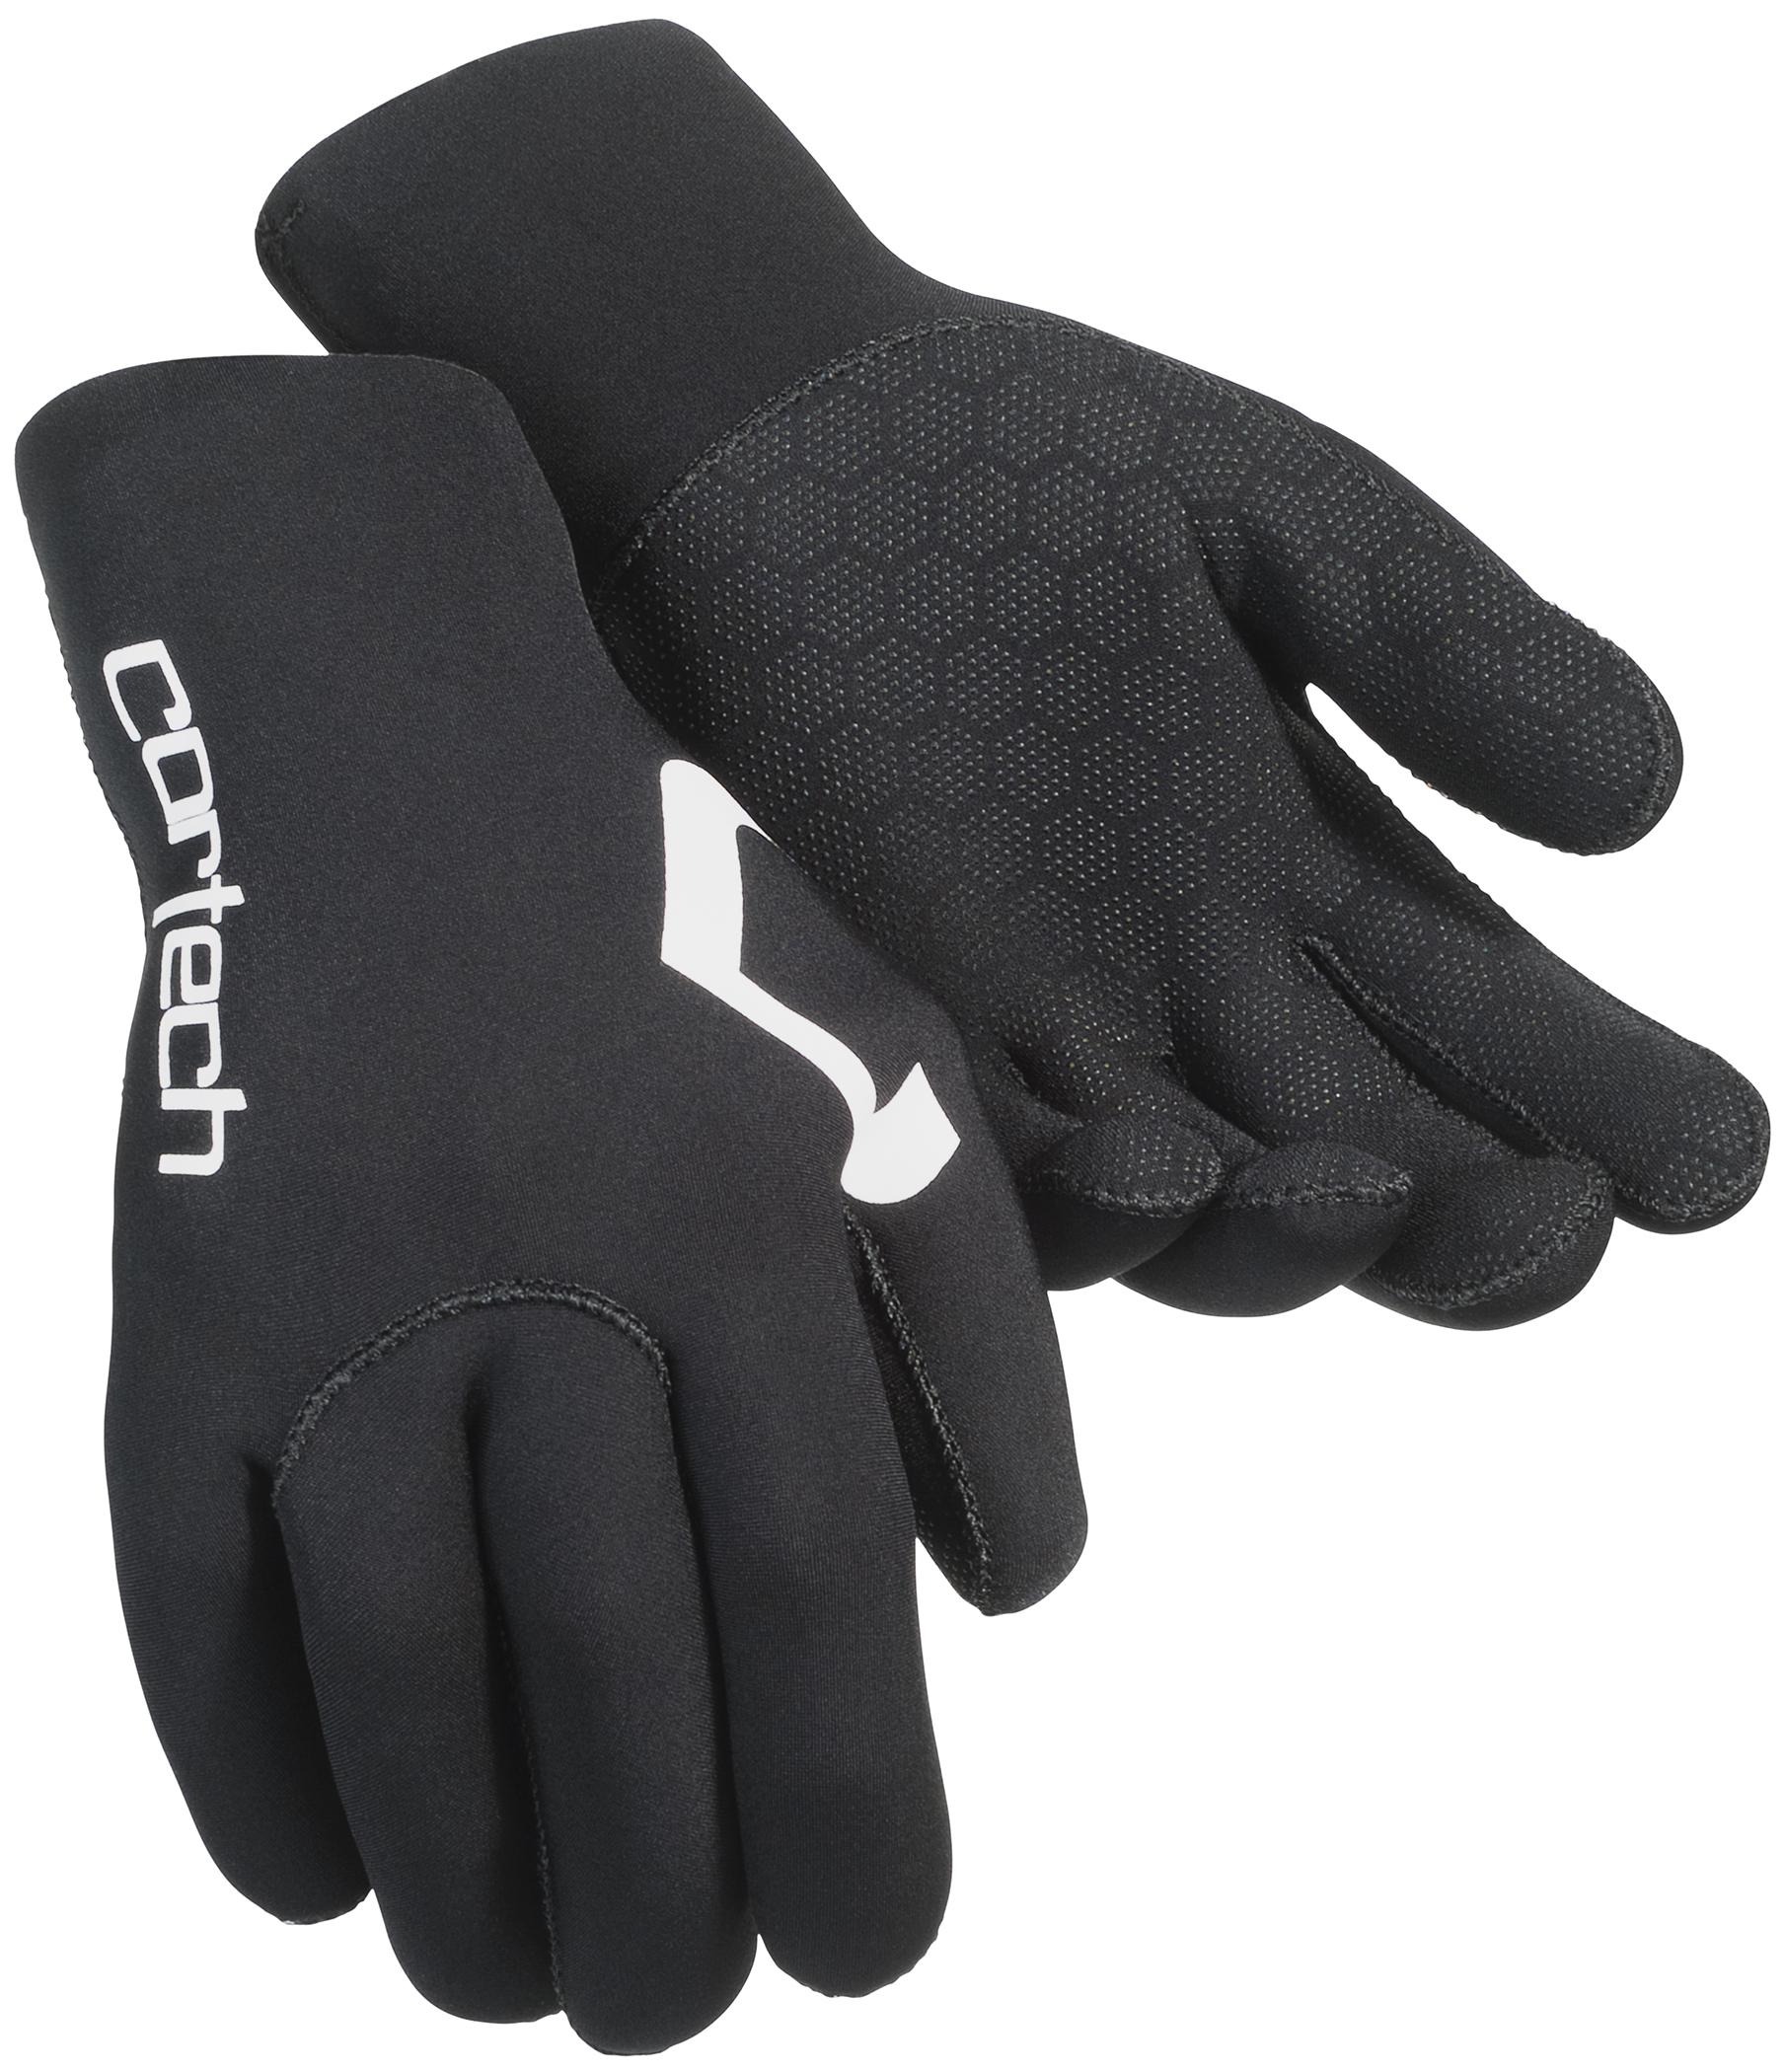 Cortech mens gloves blitz neoprene motorcycle with honeycomb